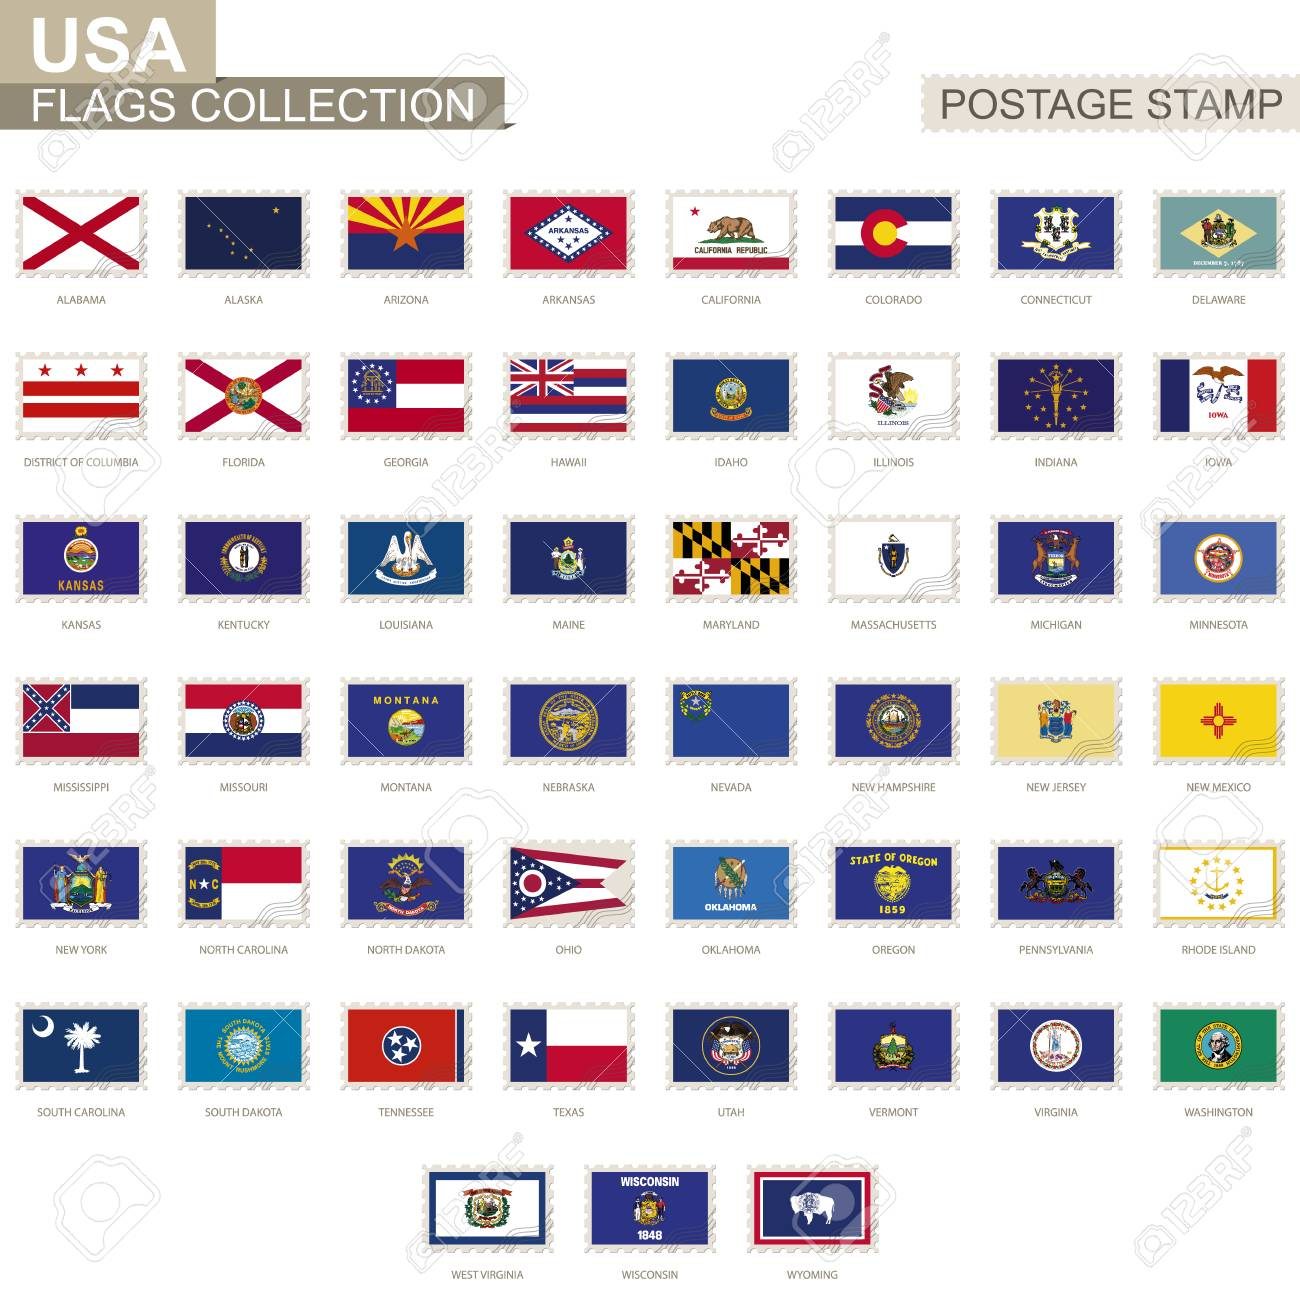 postage stamp with usa